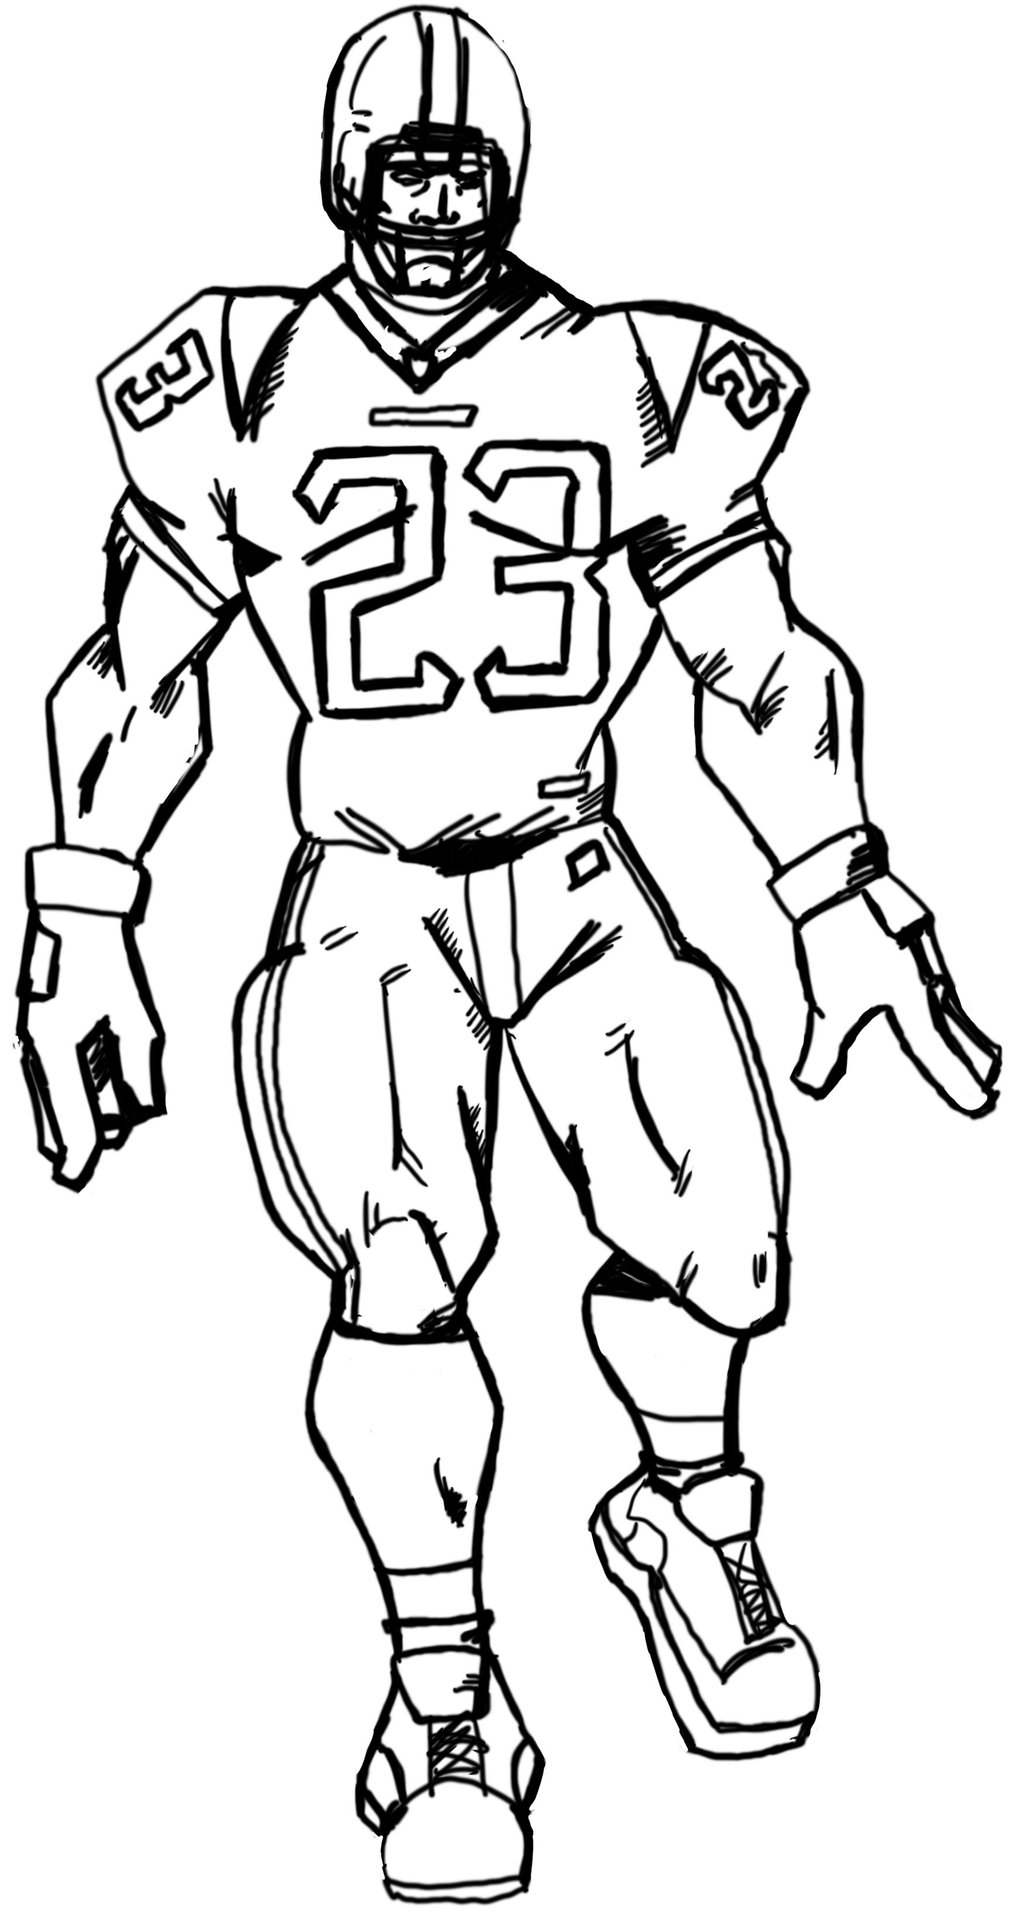 Football Player Drawings